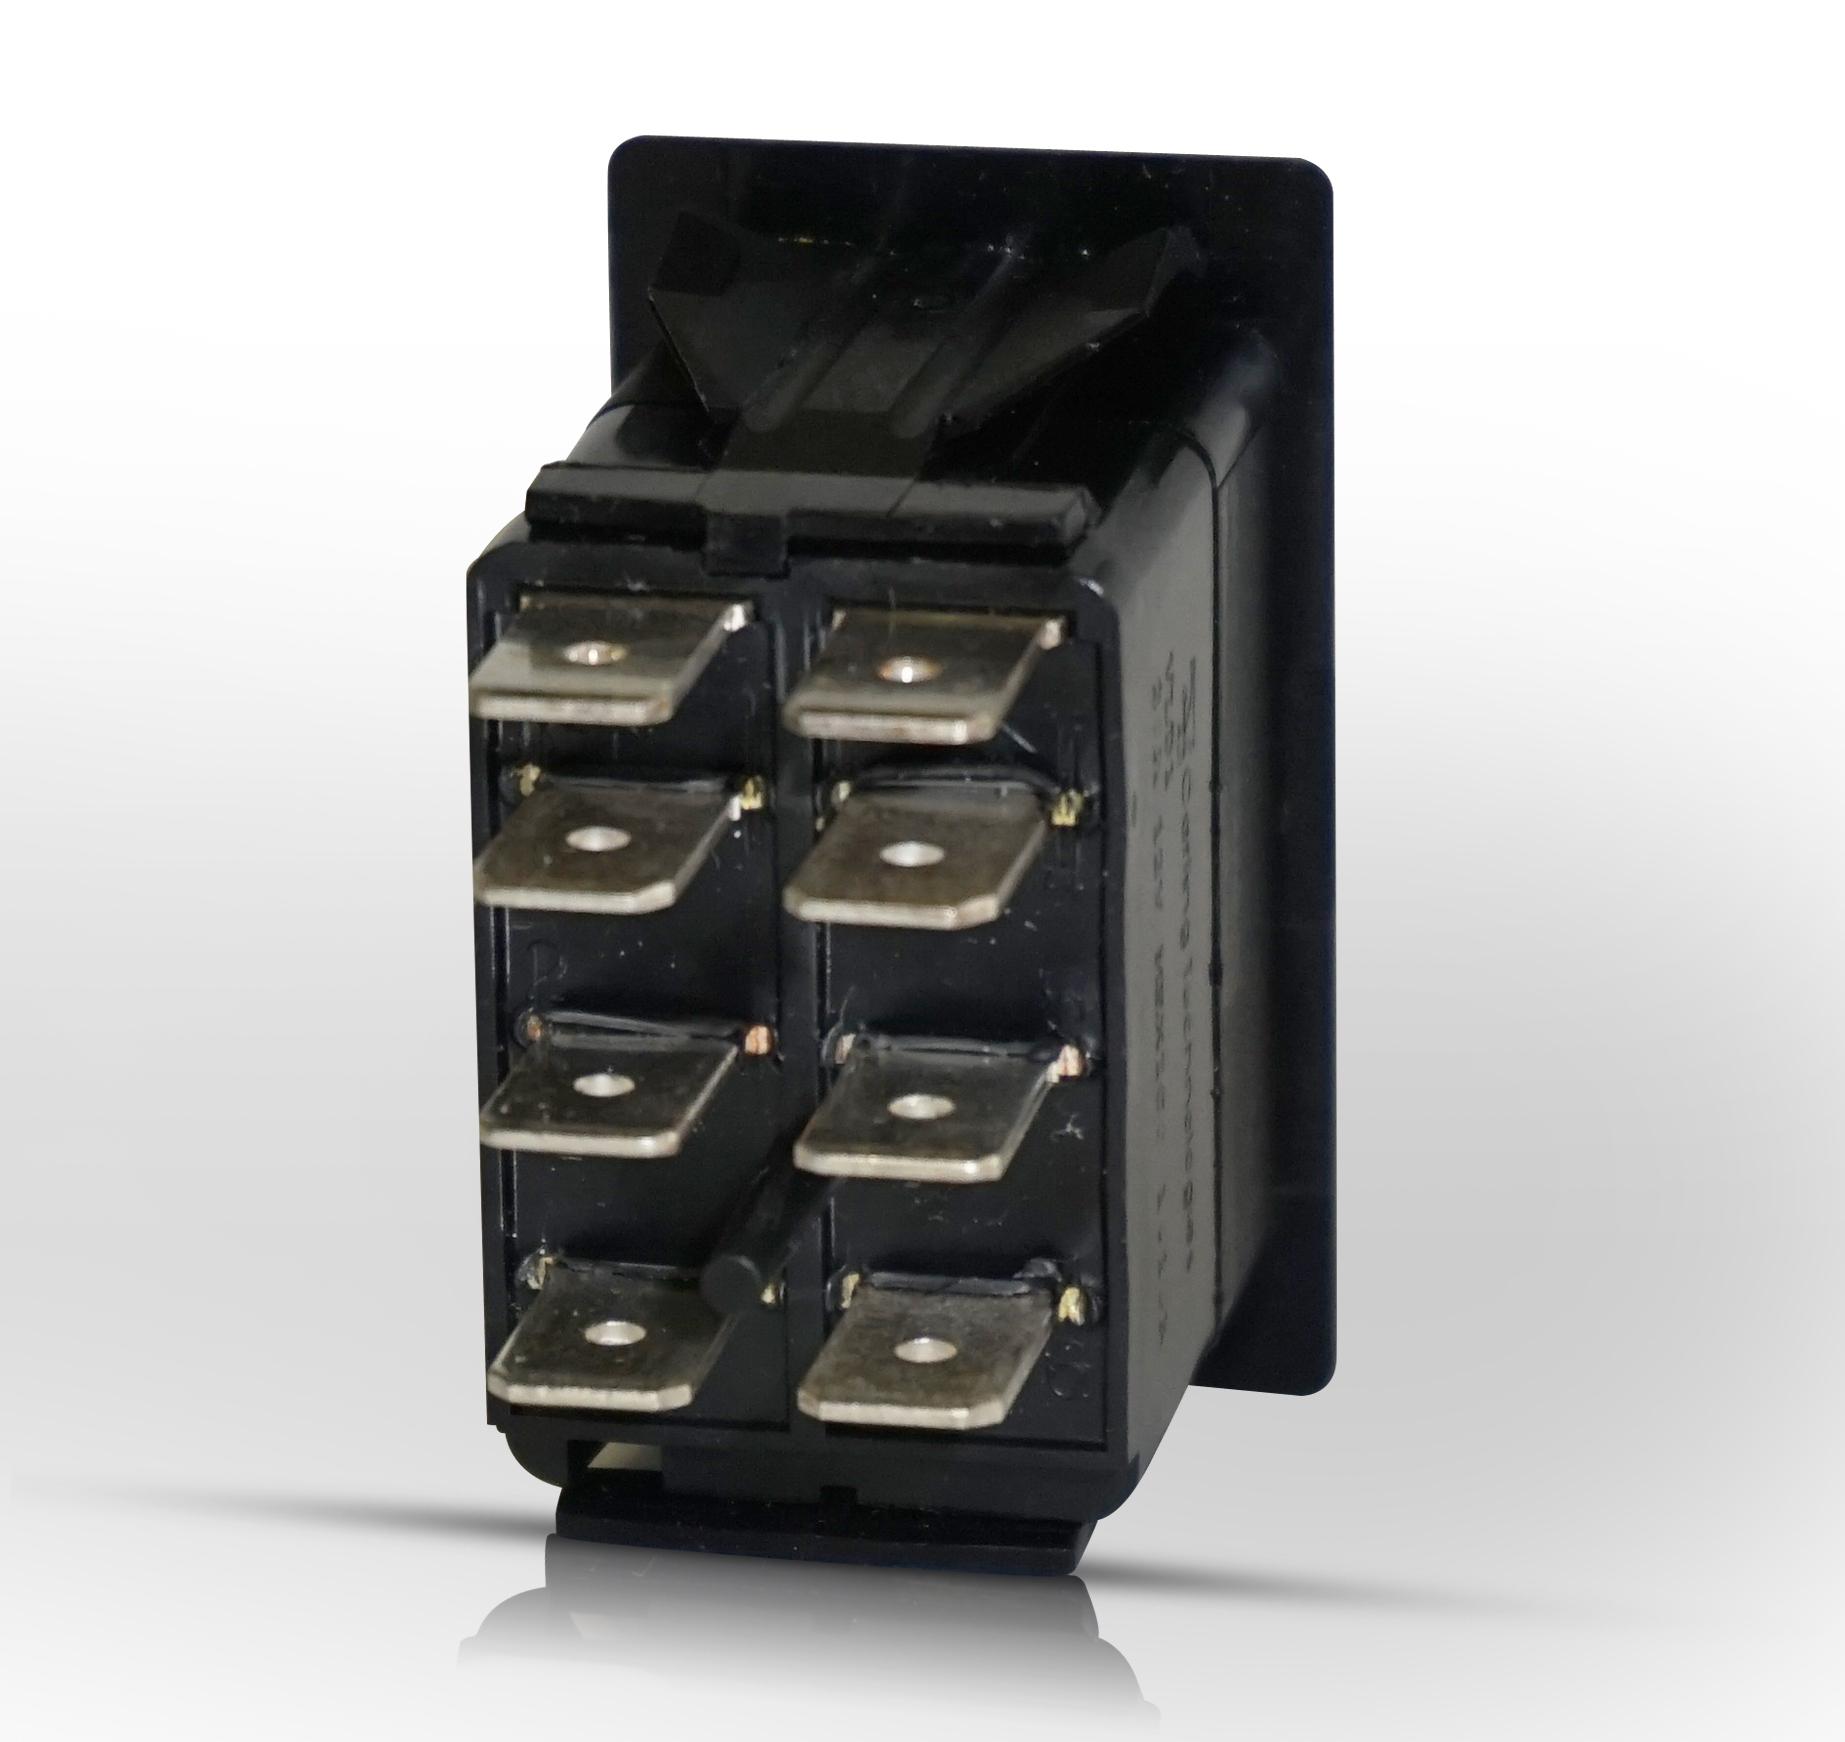 Momentary Switch | (On)-Off-(On) | Rocker Switch Pros - 8 Pin Rocker Switch Wiring Diagram